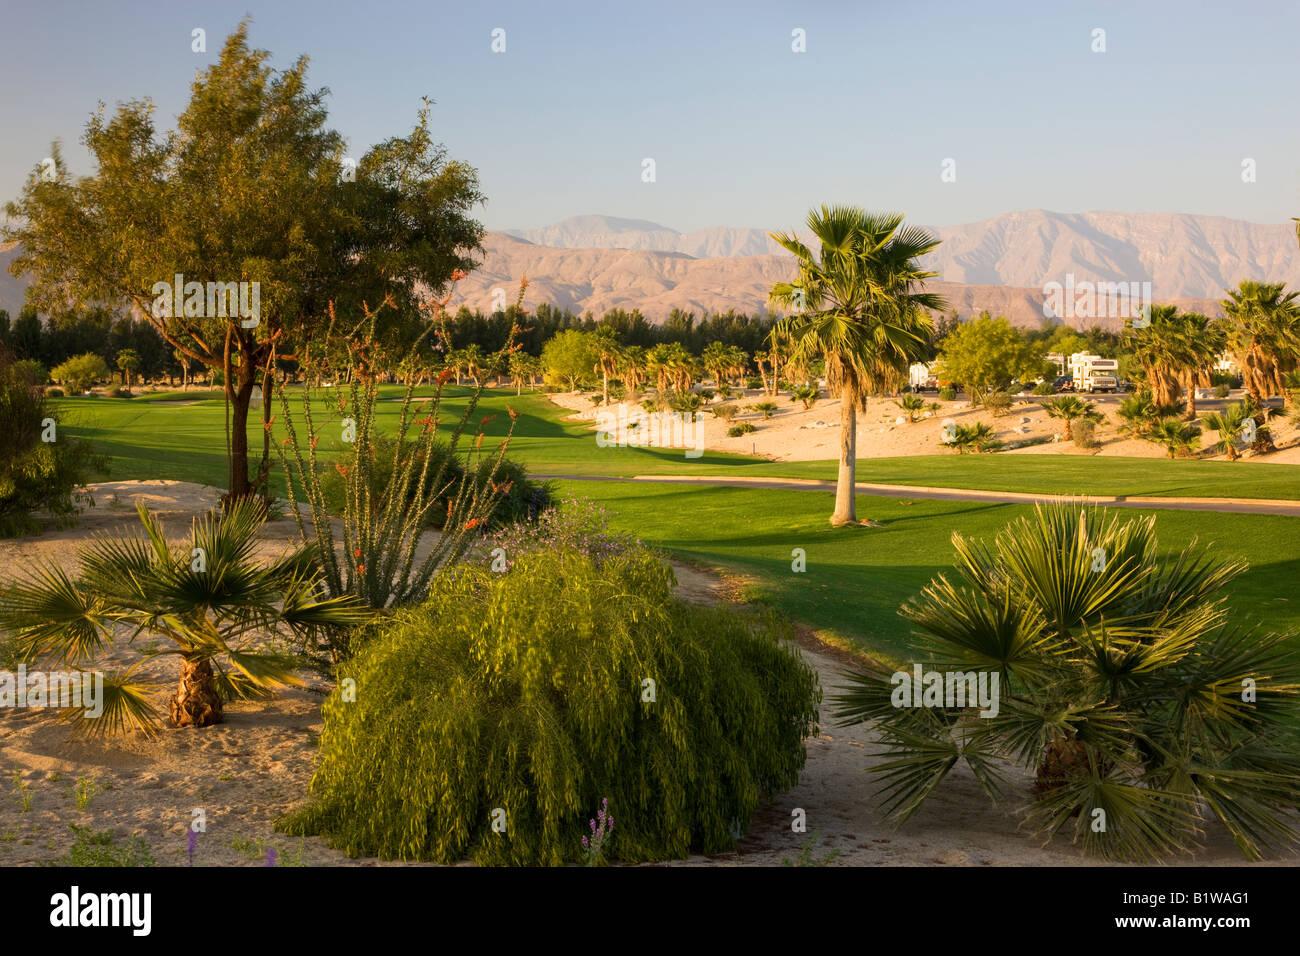 The Springs at Borrego RV Resort and Golf Anza Borrego Desert State Park Borrego Springs California - Stock Image